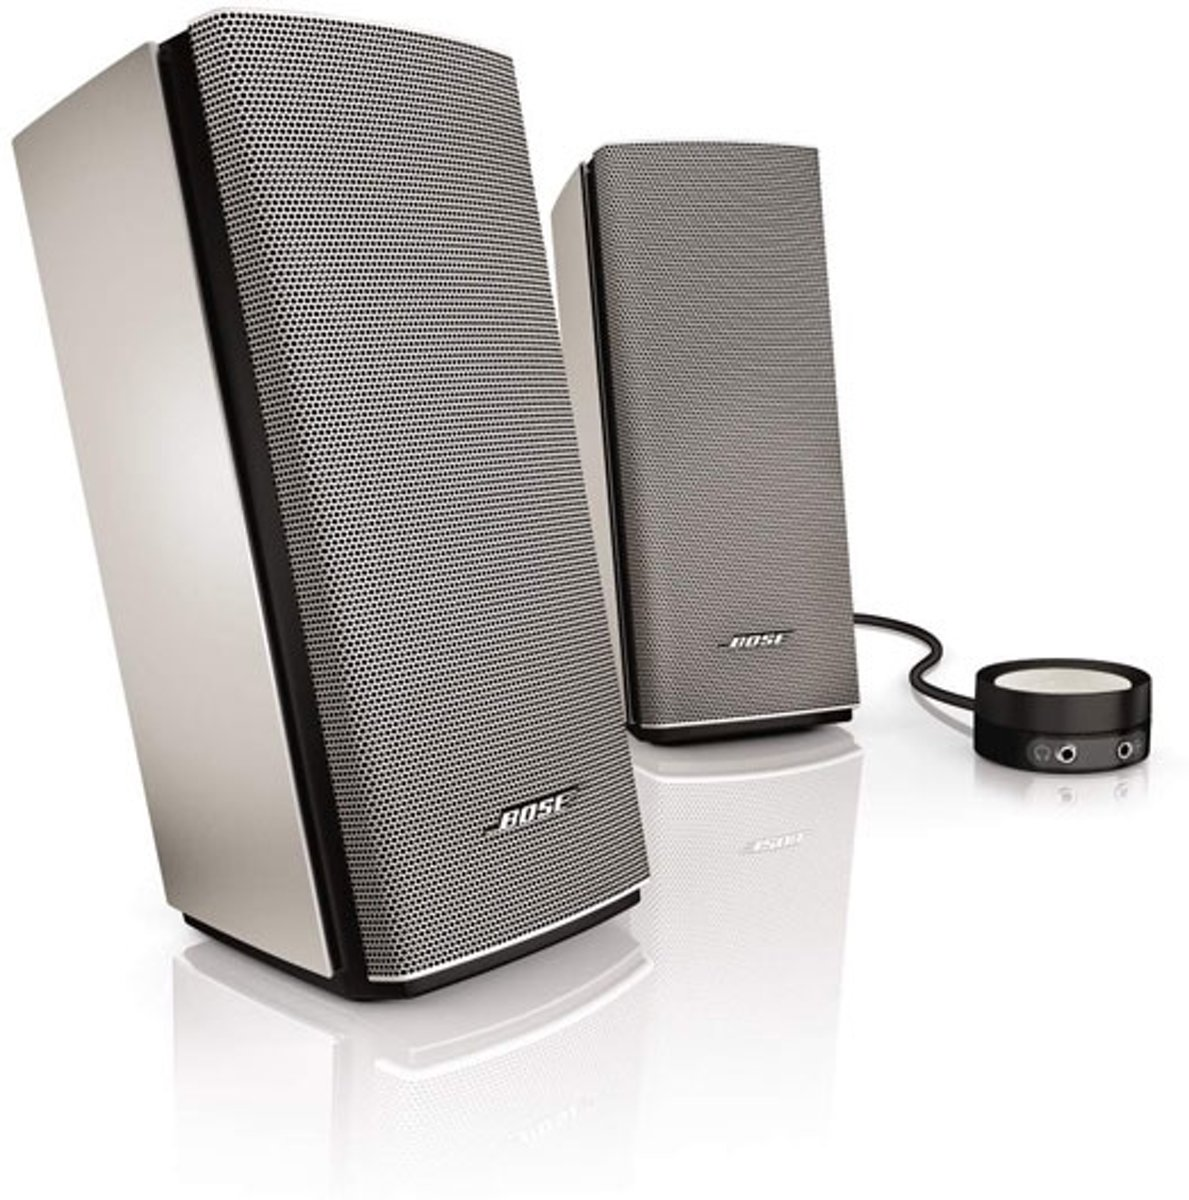 Bose Companion 20 - Pc Speakers